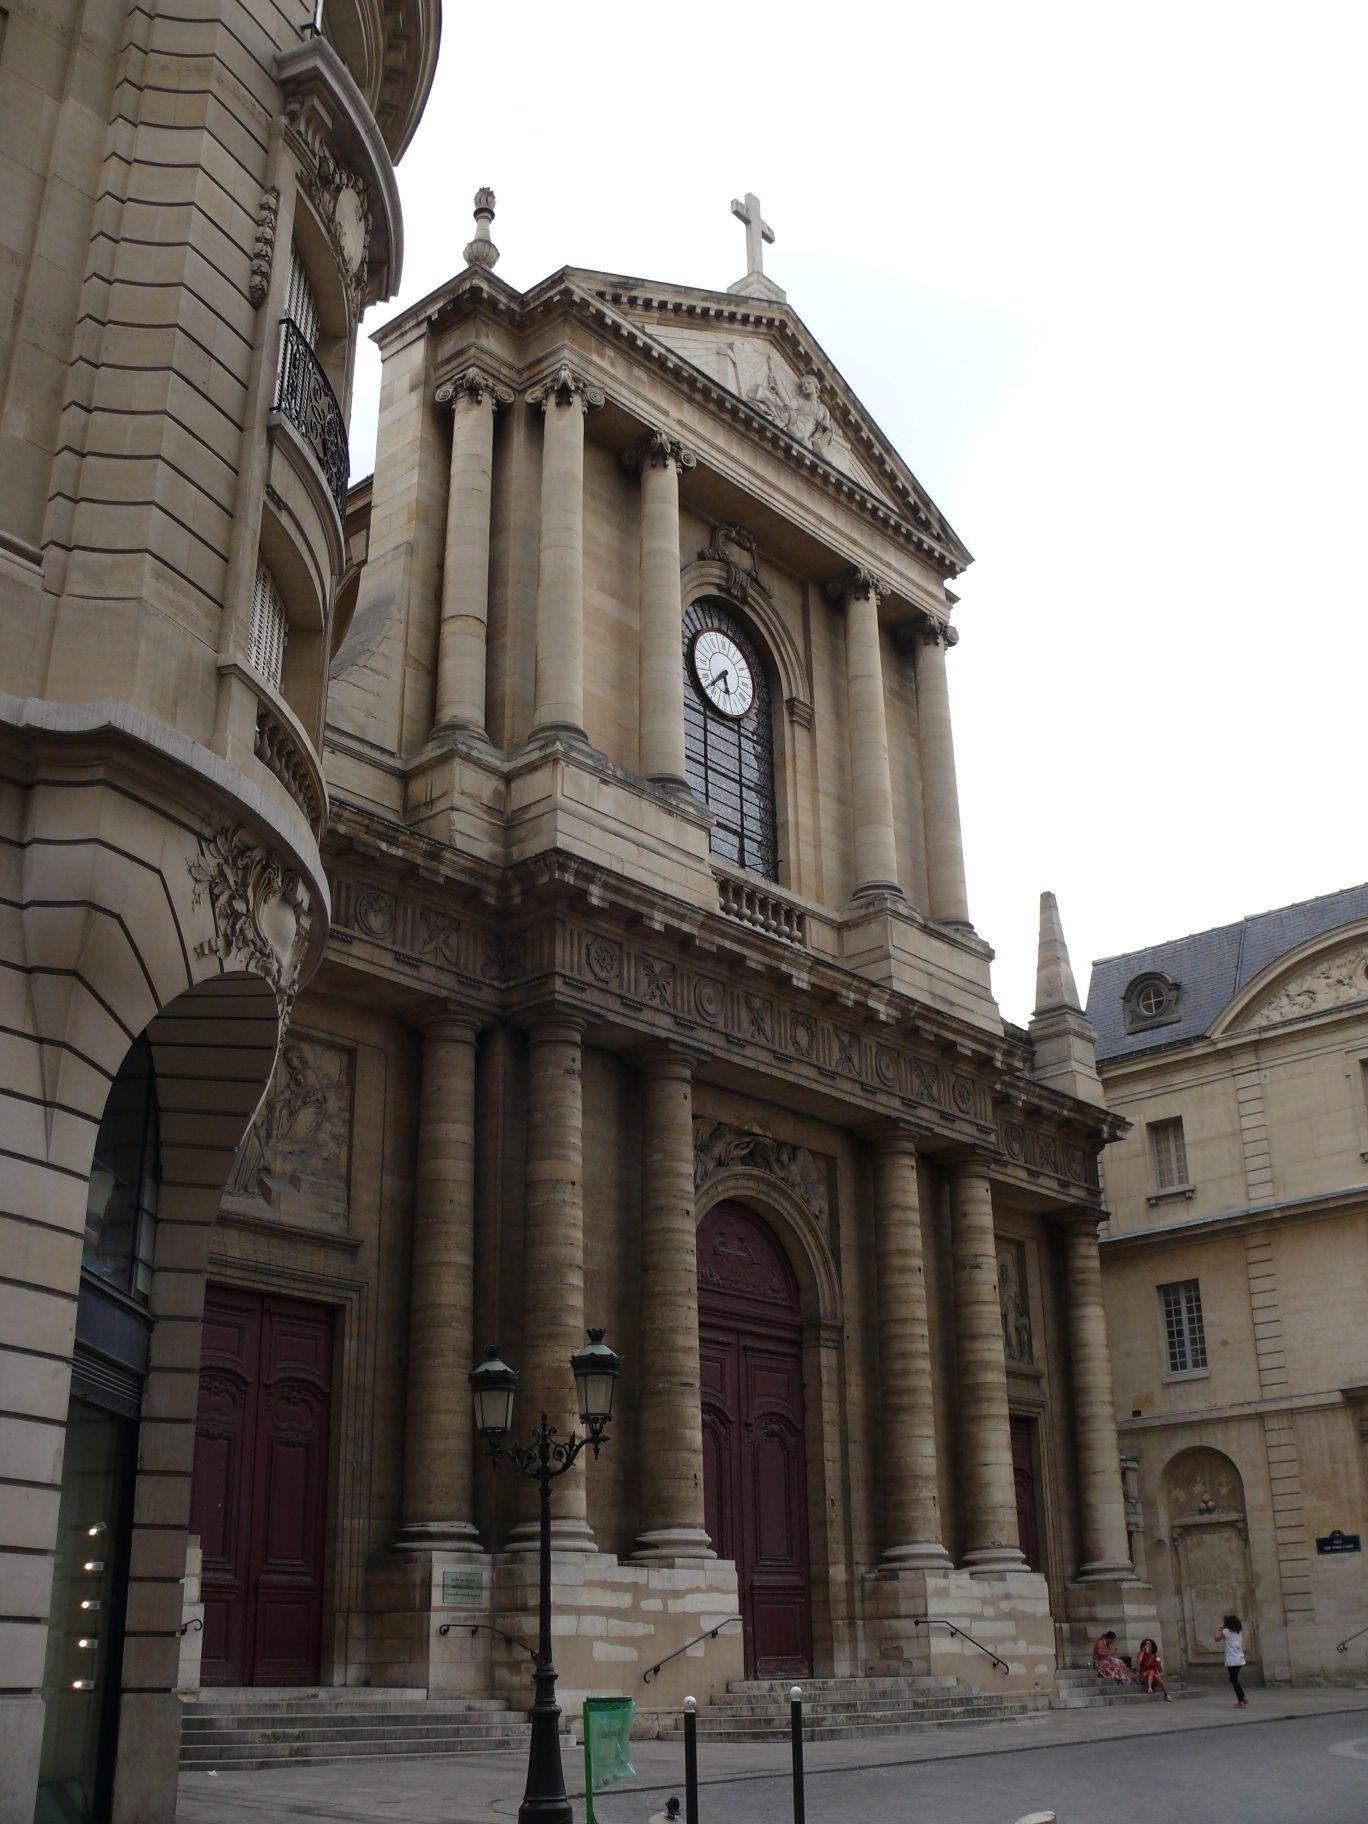 Eglise Saint Thomas D Aquin : eglise, saint, thomas, aquin, File:Église, Saint-Thomas-d'Aquin, (Paris), 5.jpg, Wikimedia, Commons